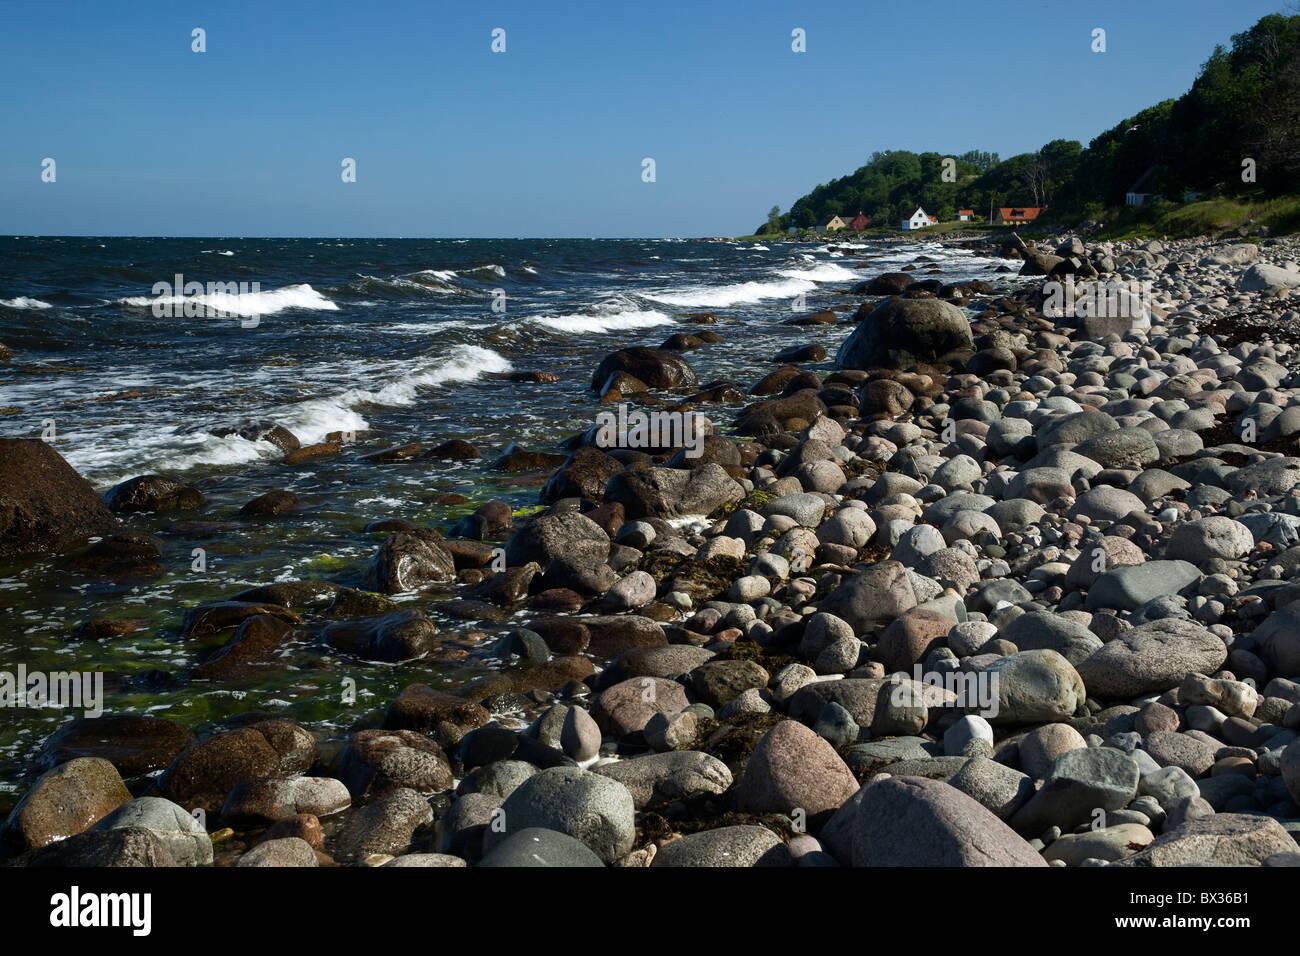 Stony Shore. Bornholm. Denmark. In the background the little fishing village, Helligpeder (Holypeter). Stock Photo